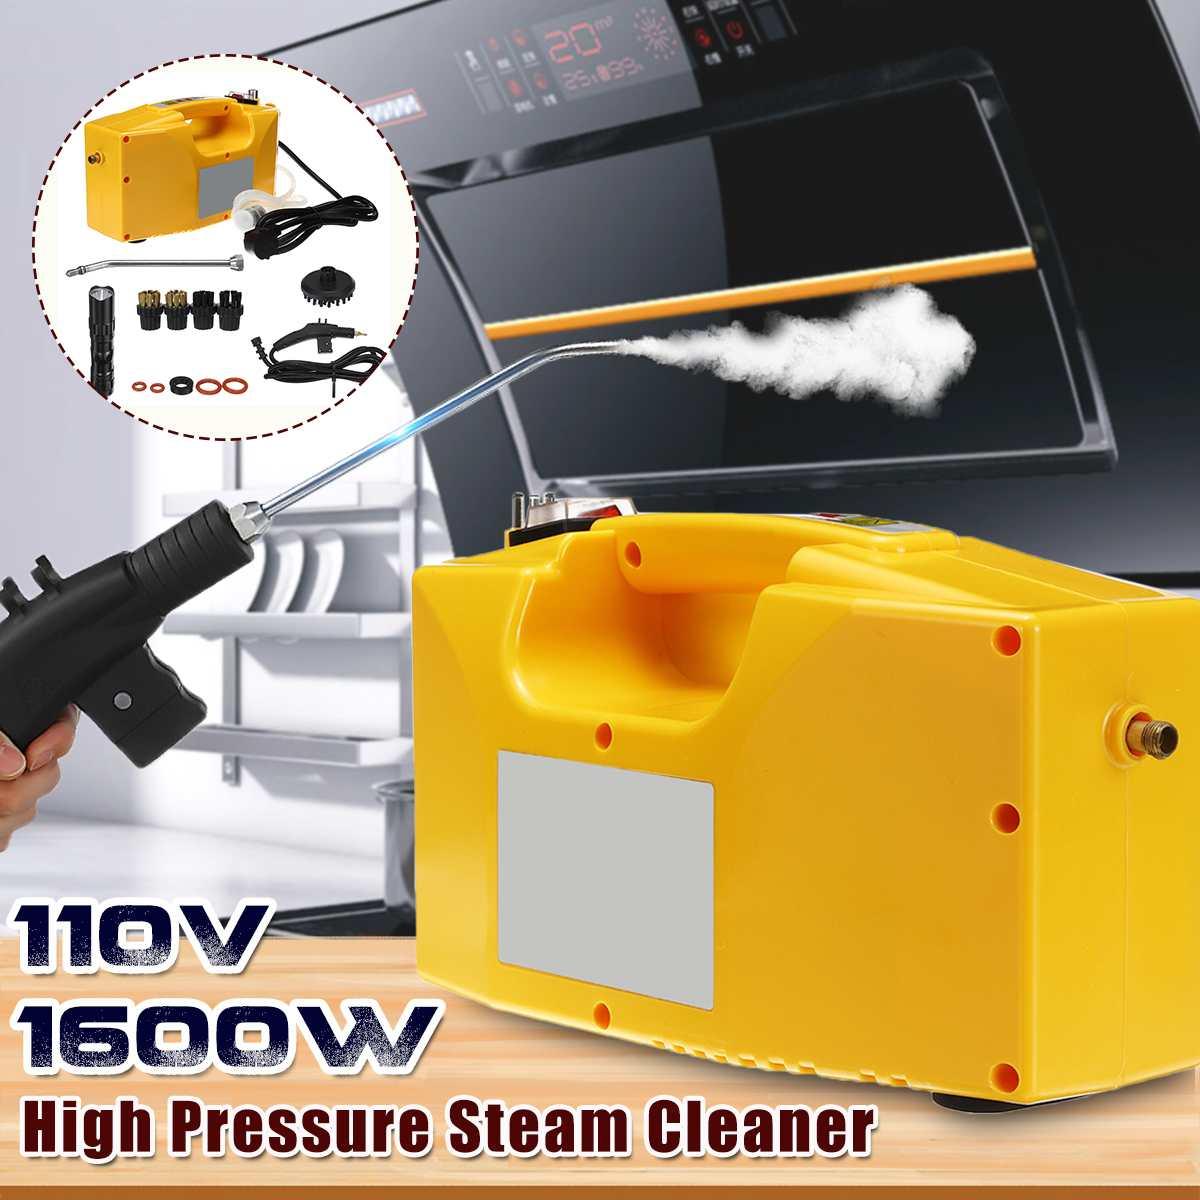 110V 1600W Handheld High Temperature Steam Cleaner Kitchen Electric Cleaning Machine Sterilization Disinfector